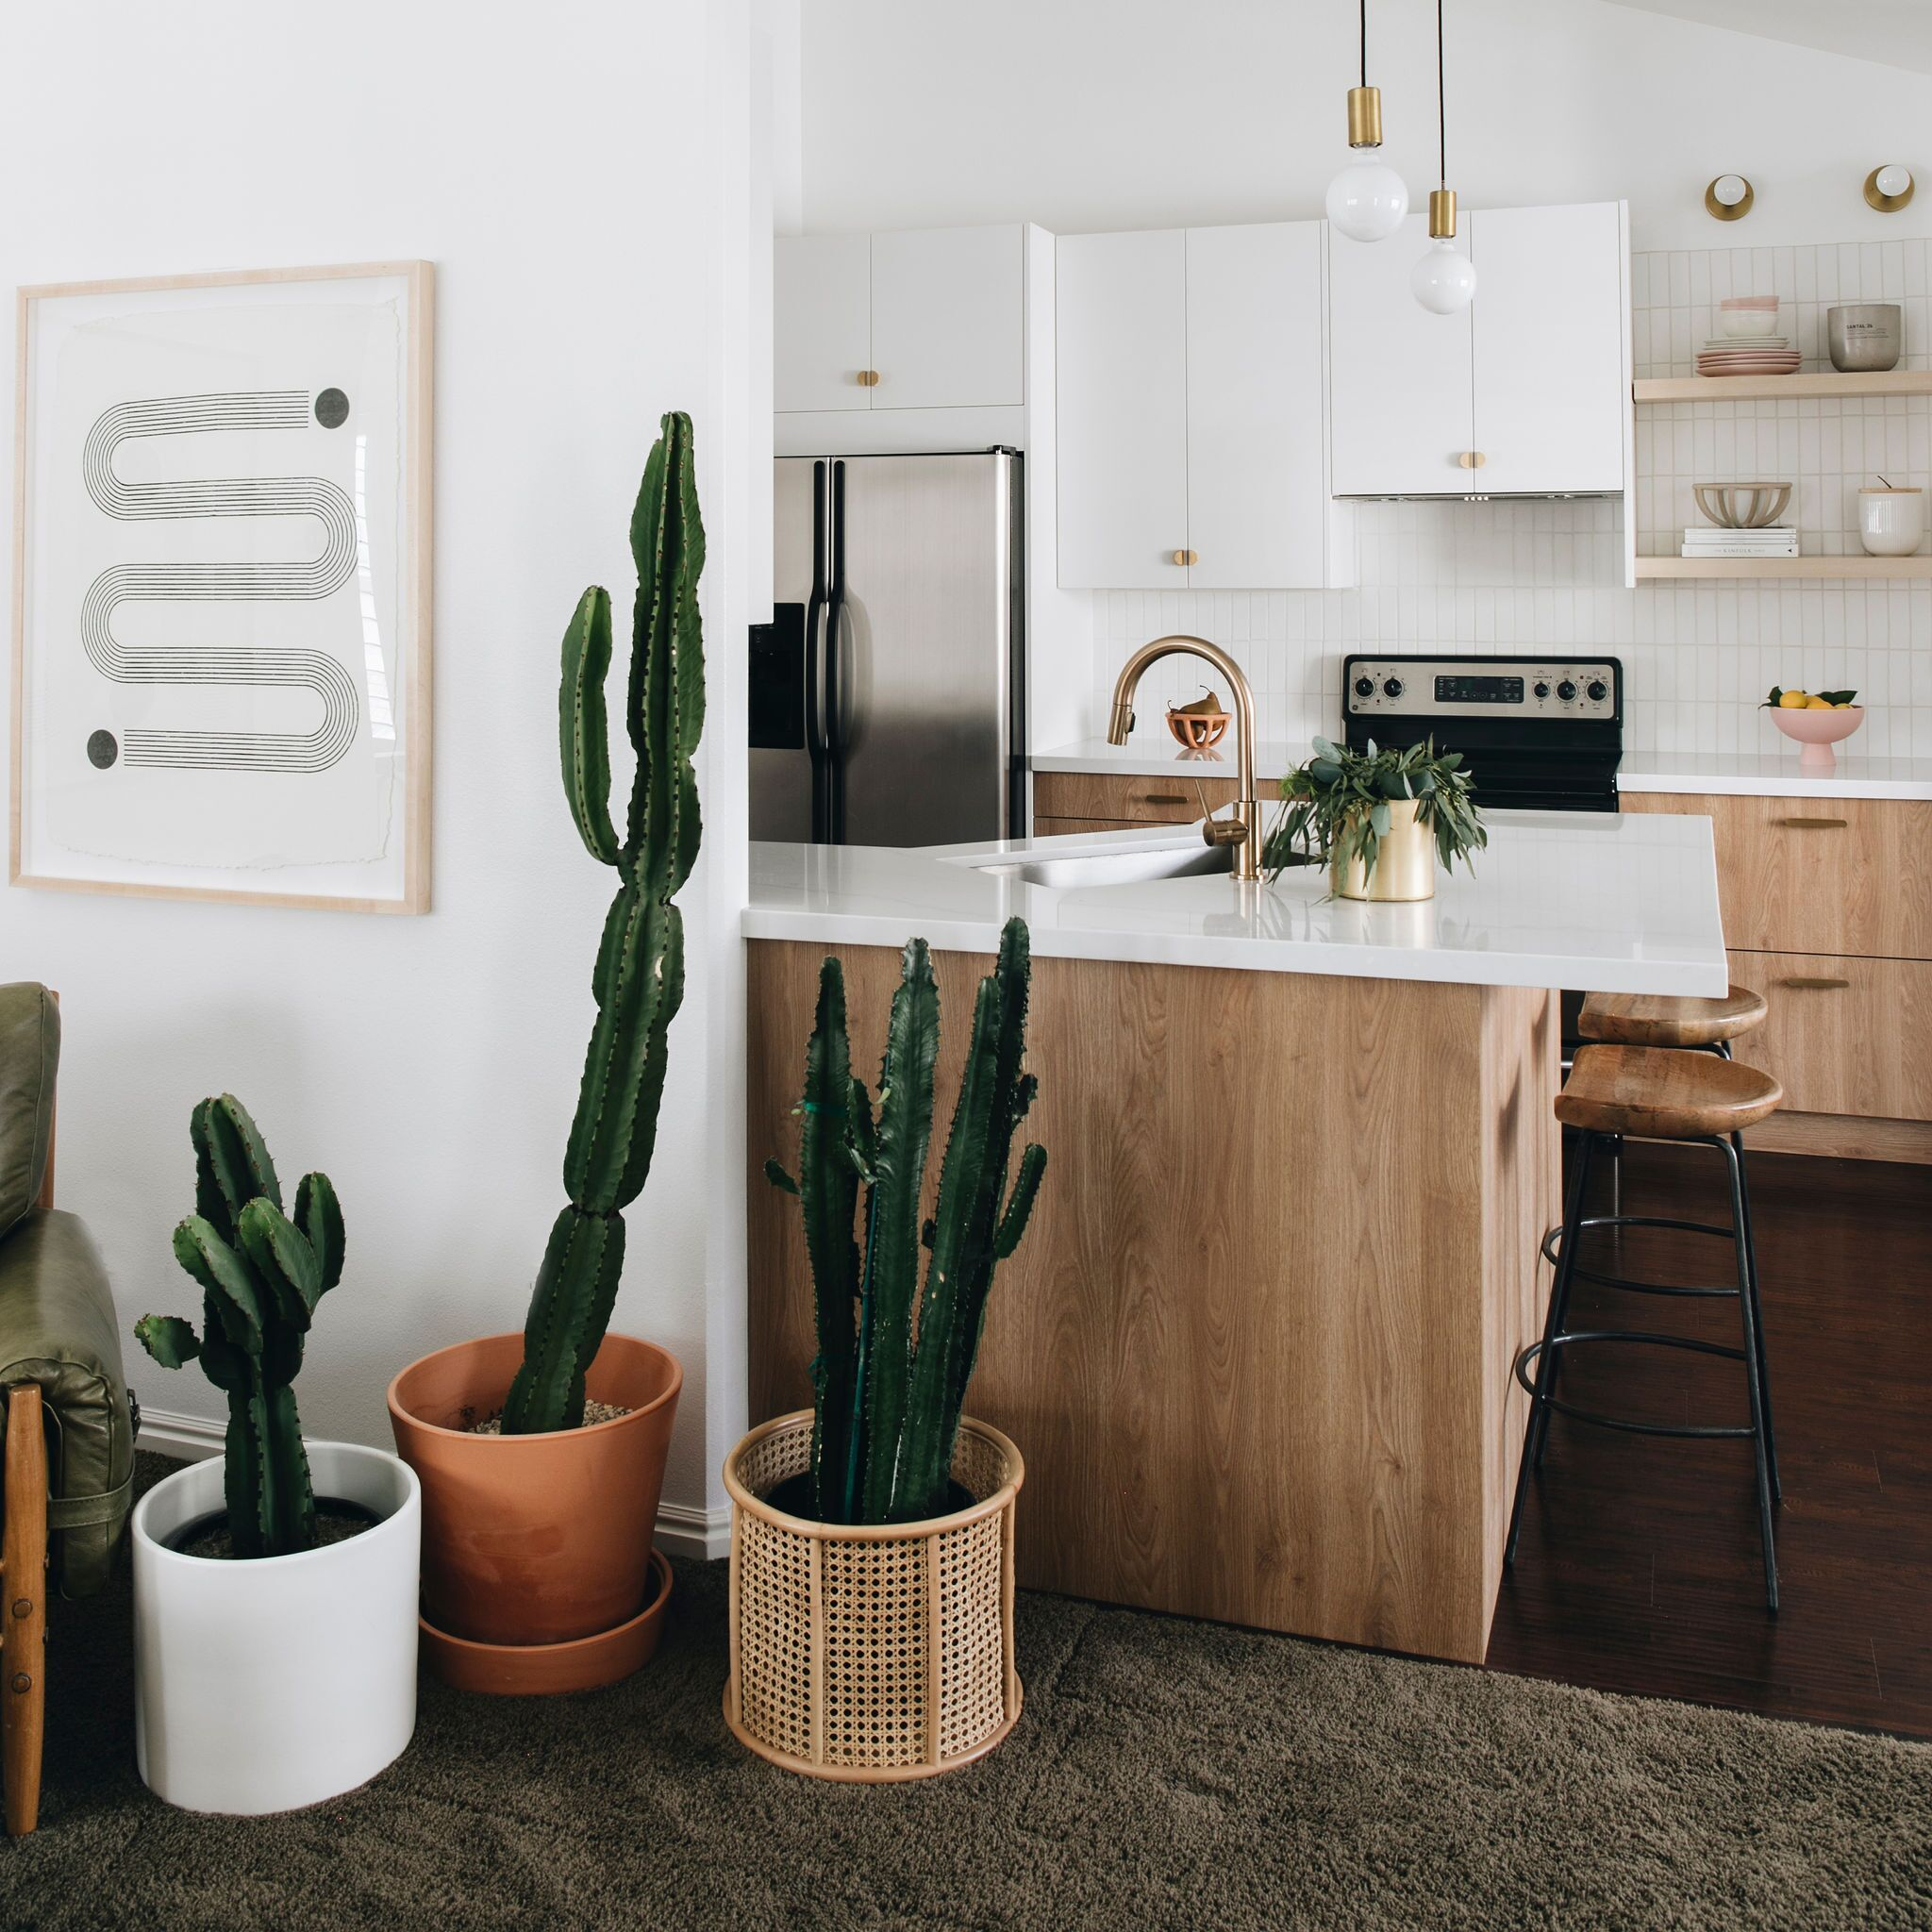 Hardware Apartments Salt Lake City: Gorgeous Kitchen Reno With A Minimalist Aesthetic In 2020